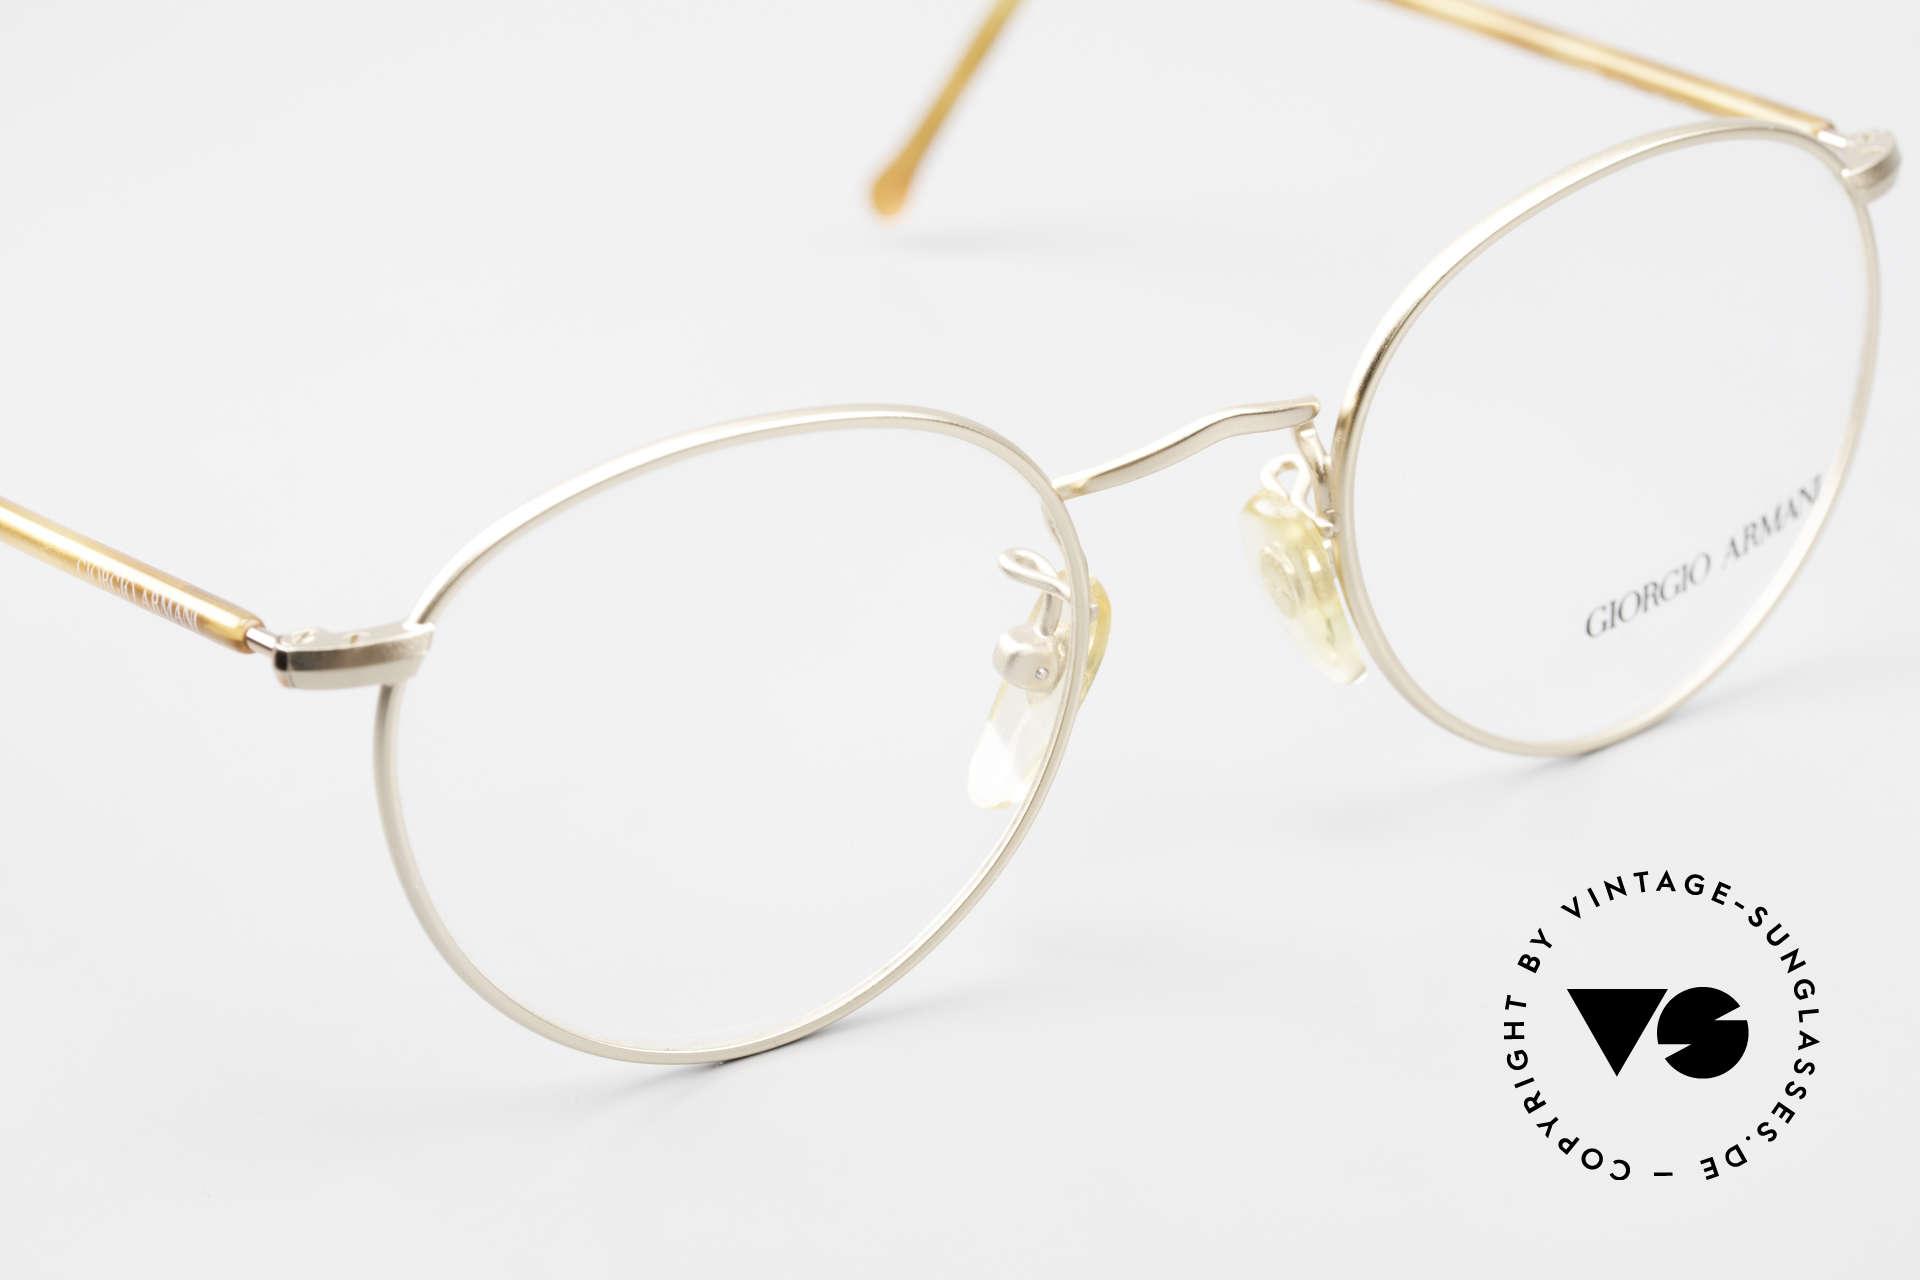 Giorgio Armani 138 Vintage Panto Eyeglasses 90's, unworn (like all our vintage GIORGIO Armani frames), Made for Men and Women